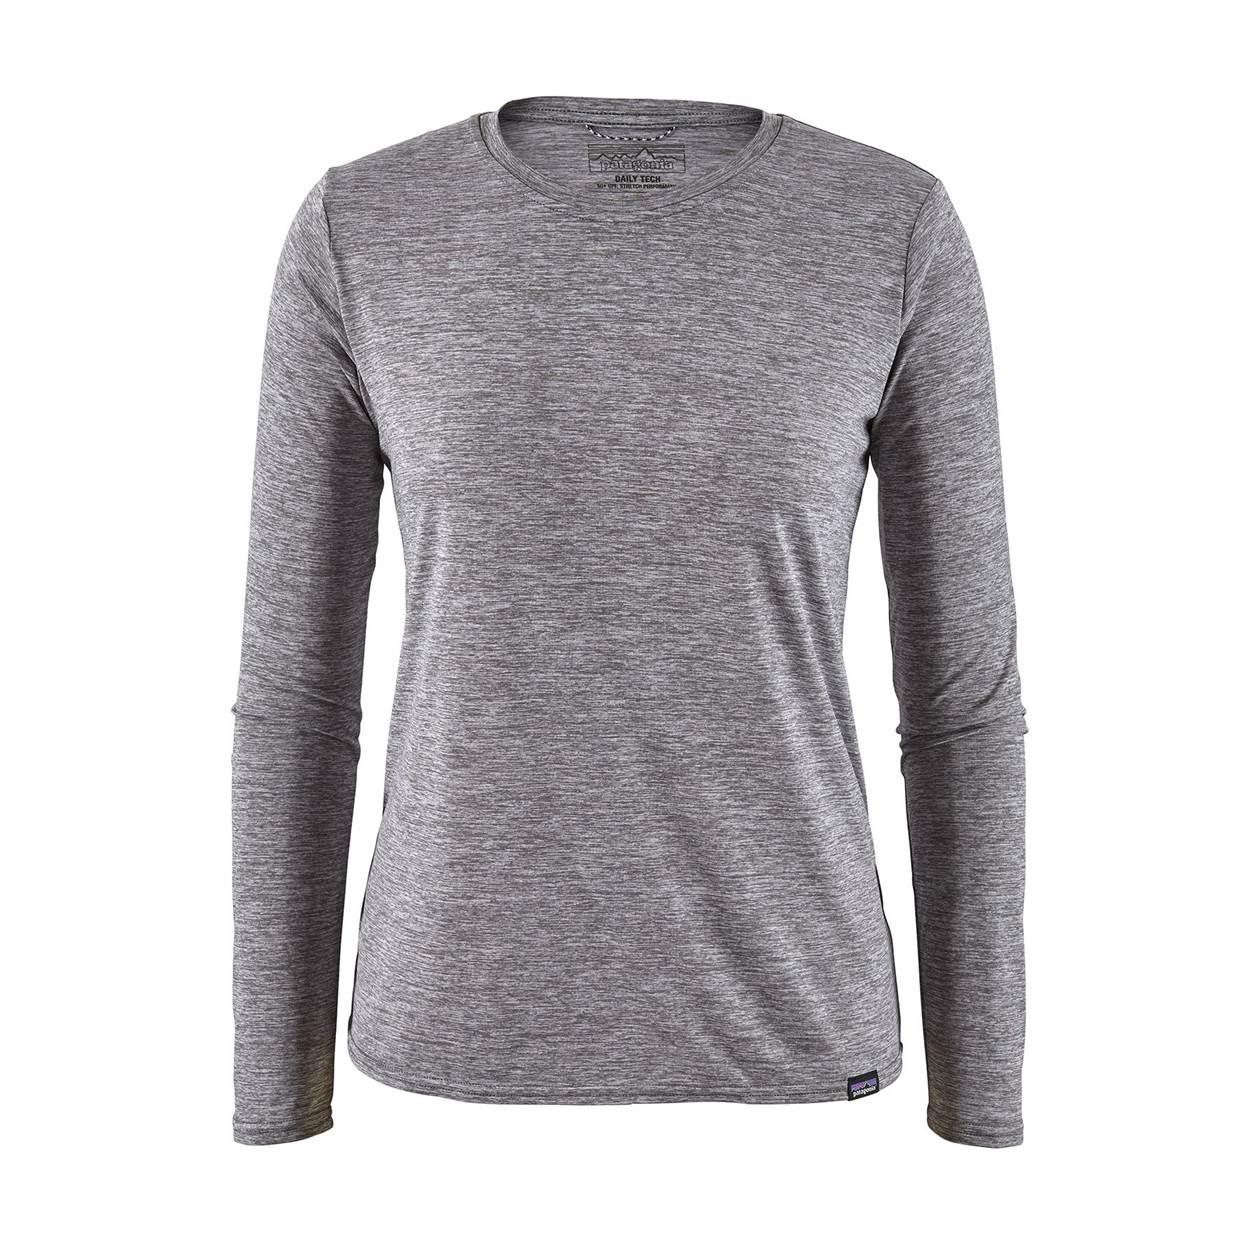 Cap Cool Daily Shirt Long Sleeve - Women's